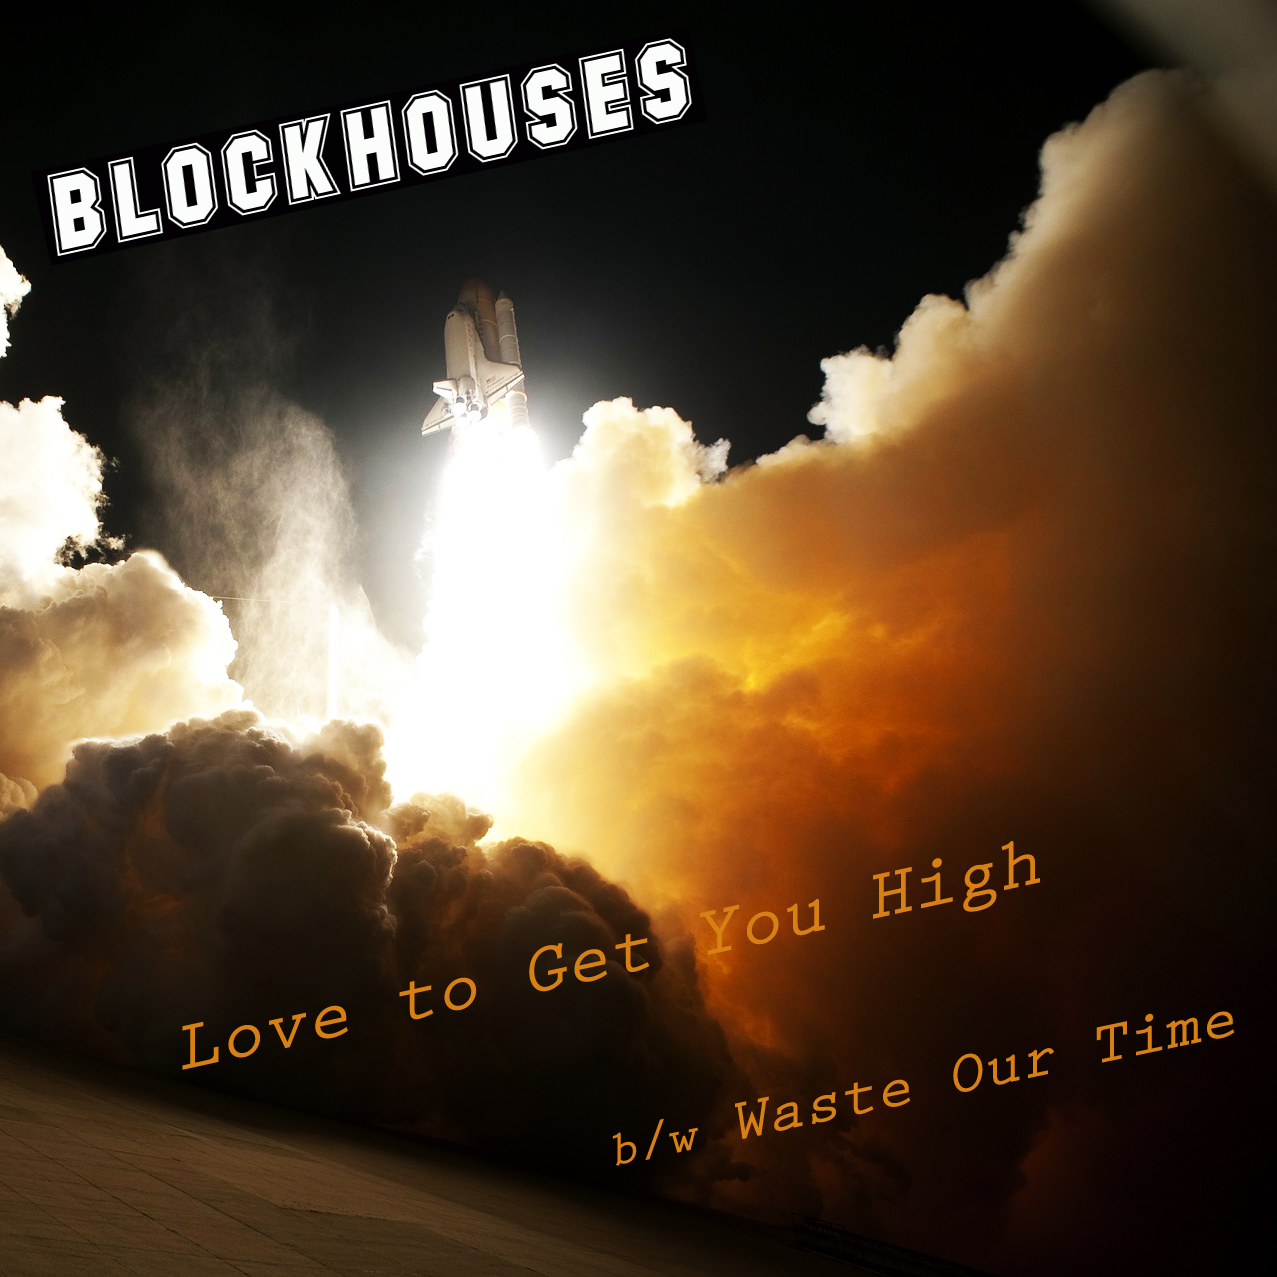 Blockhouses Get You High.jpg